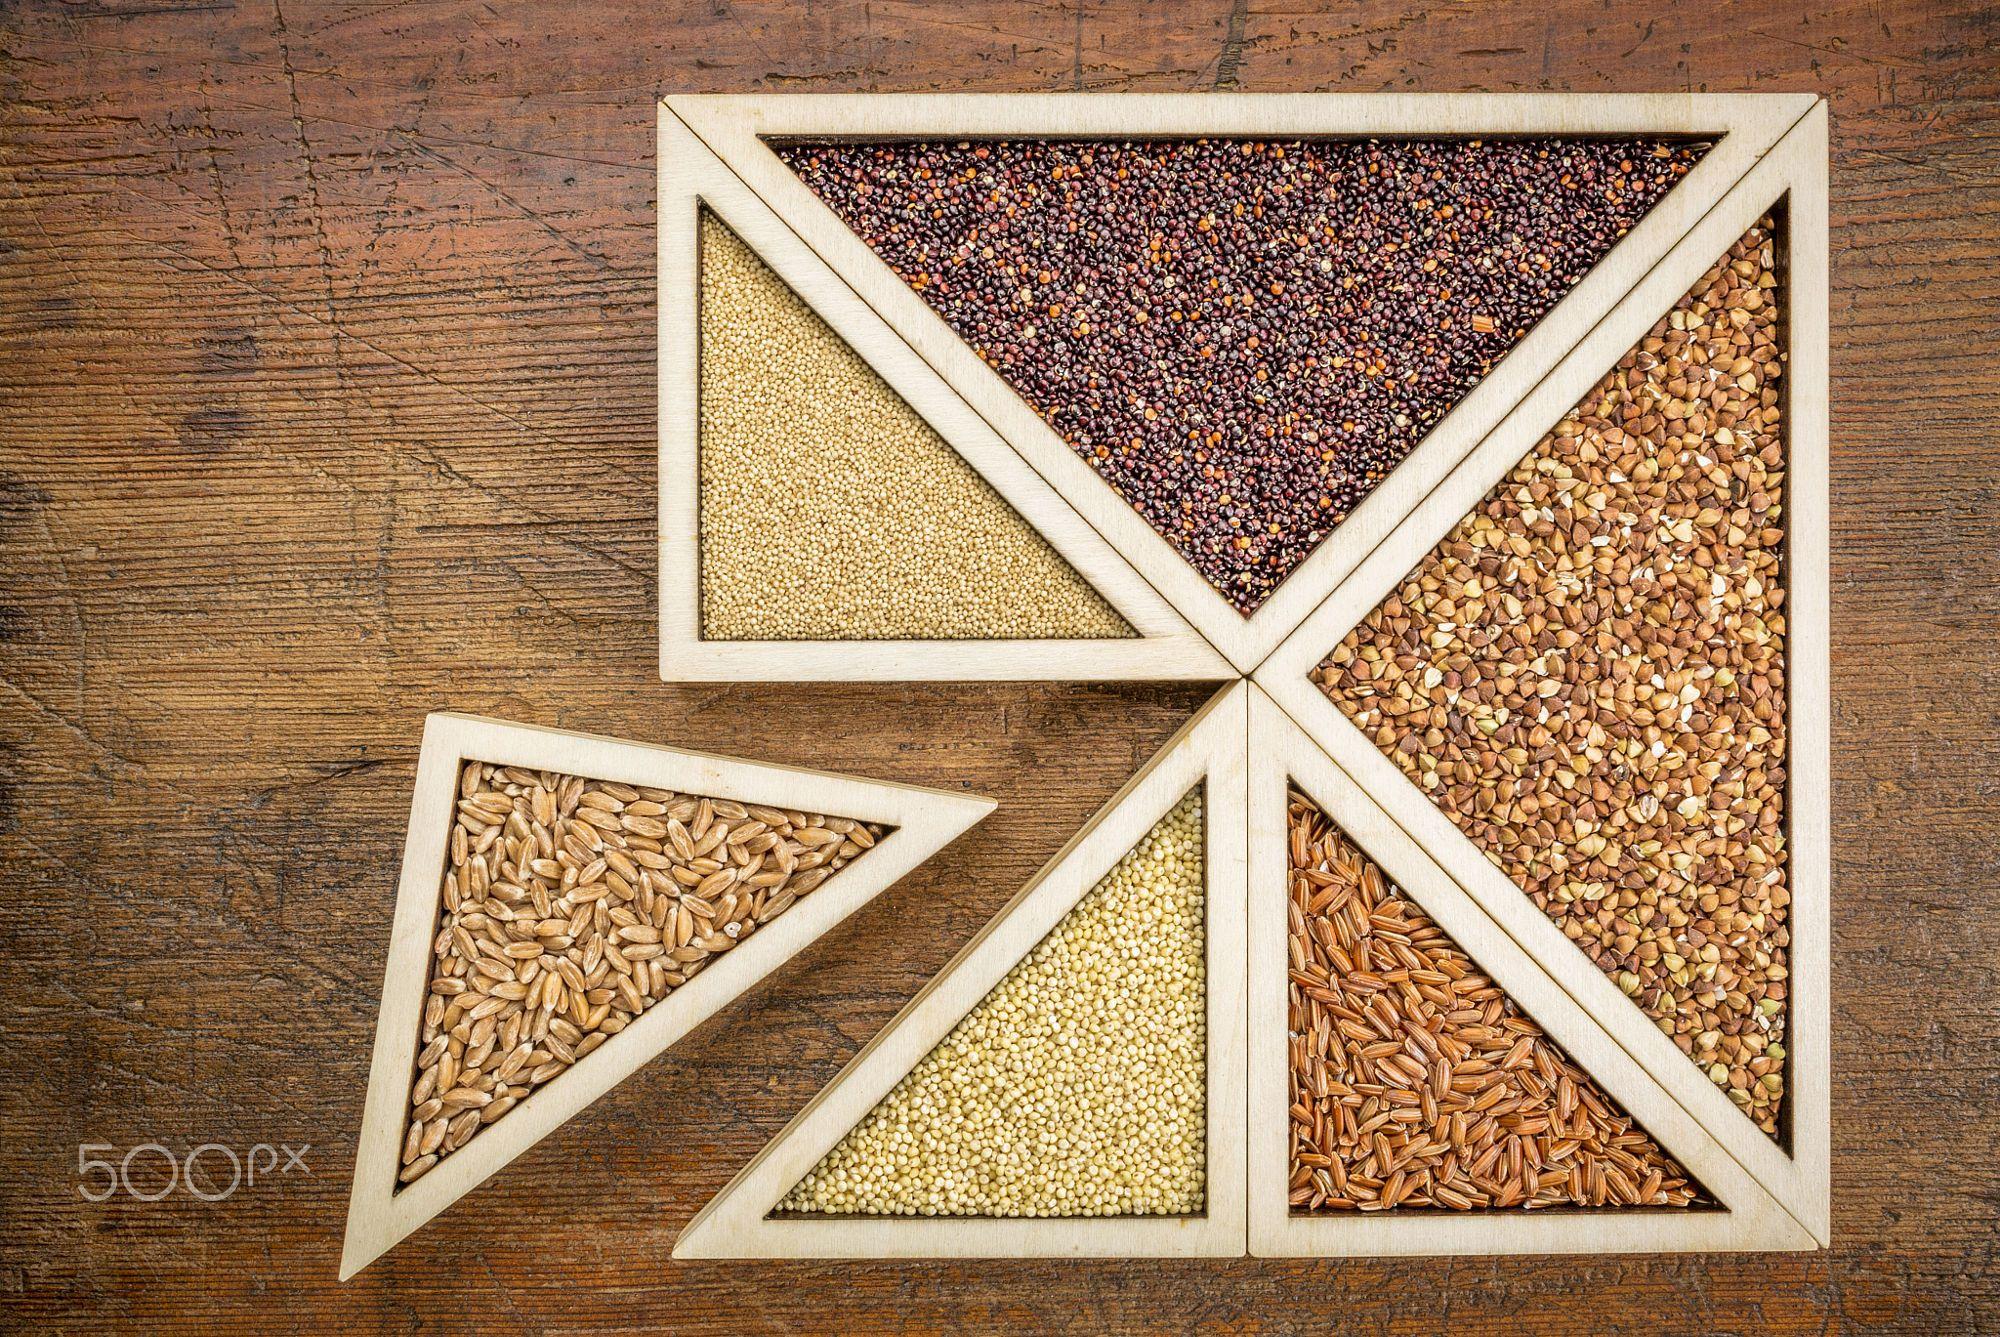 wheat and gluten free grains by Marek Uliasz on 500px